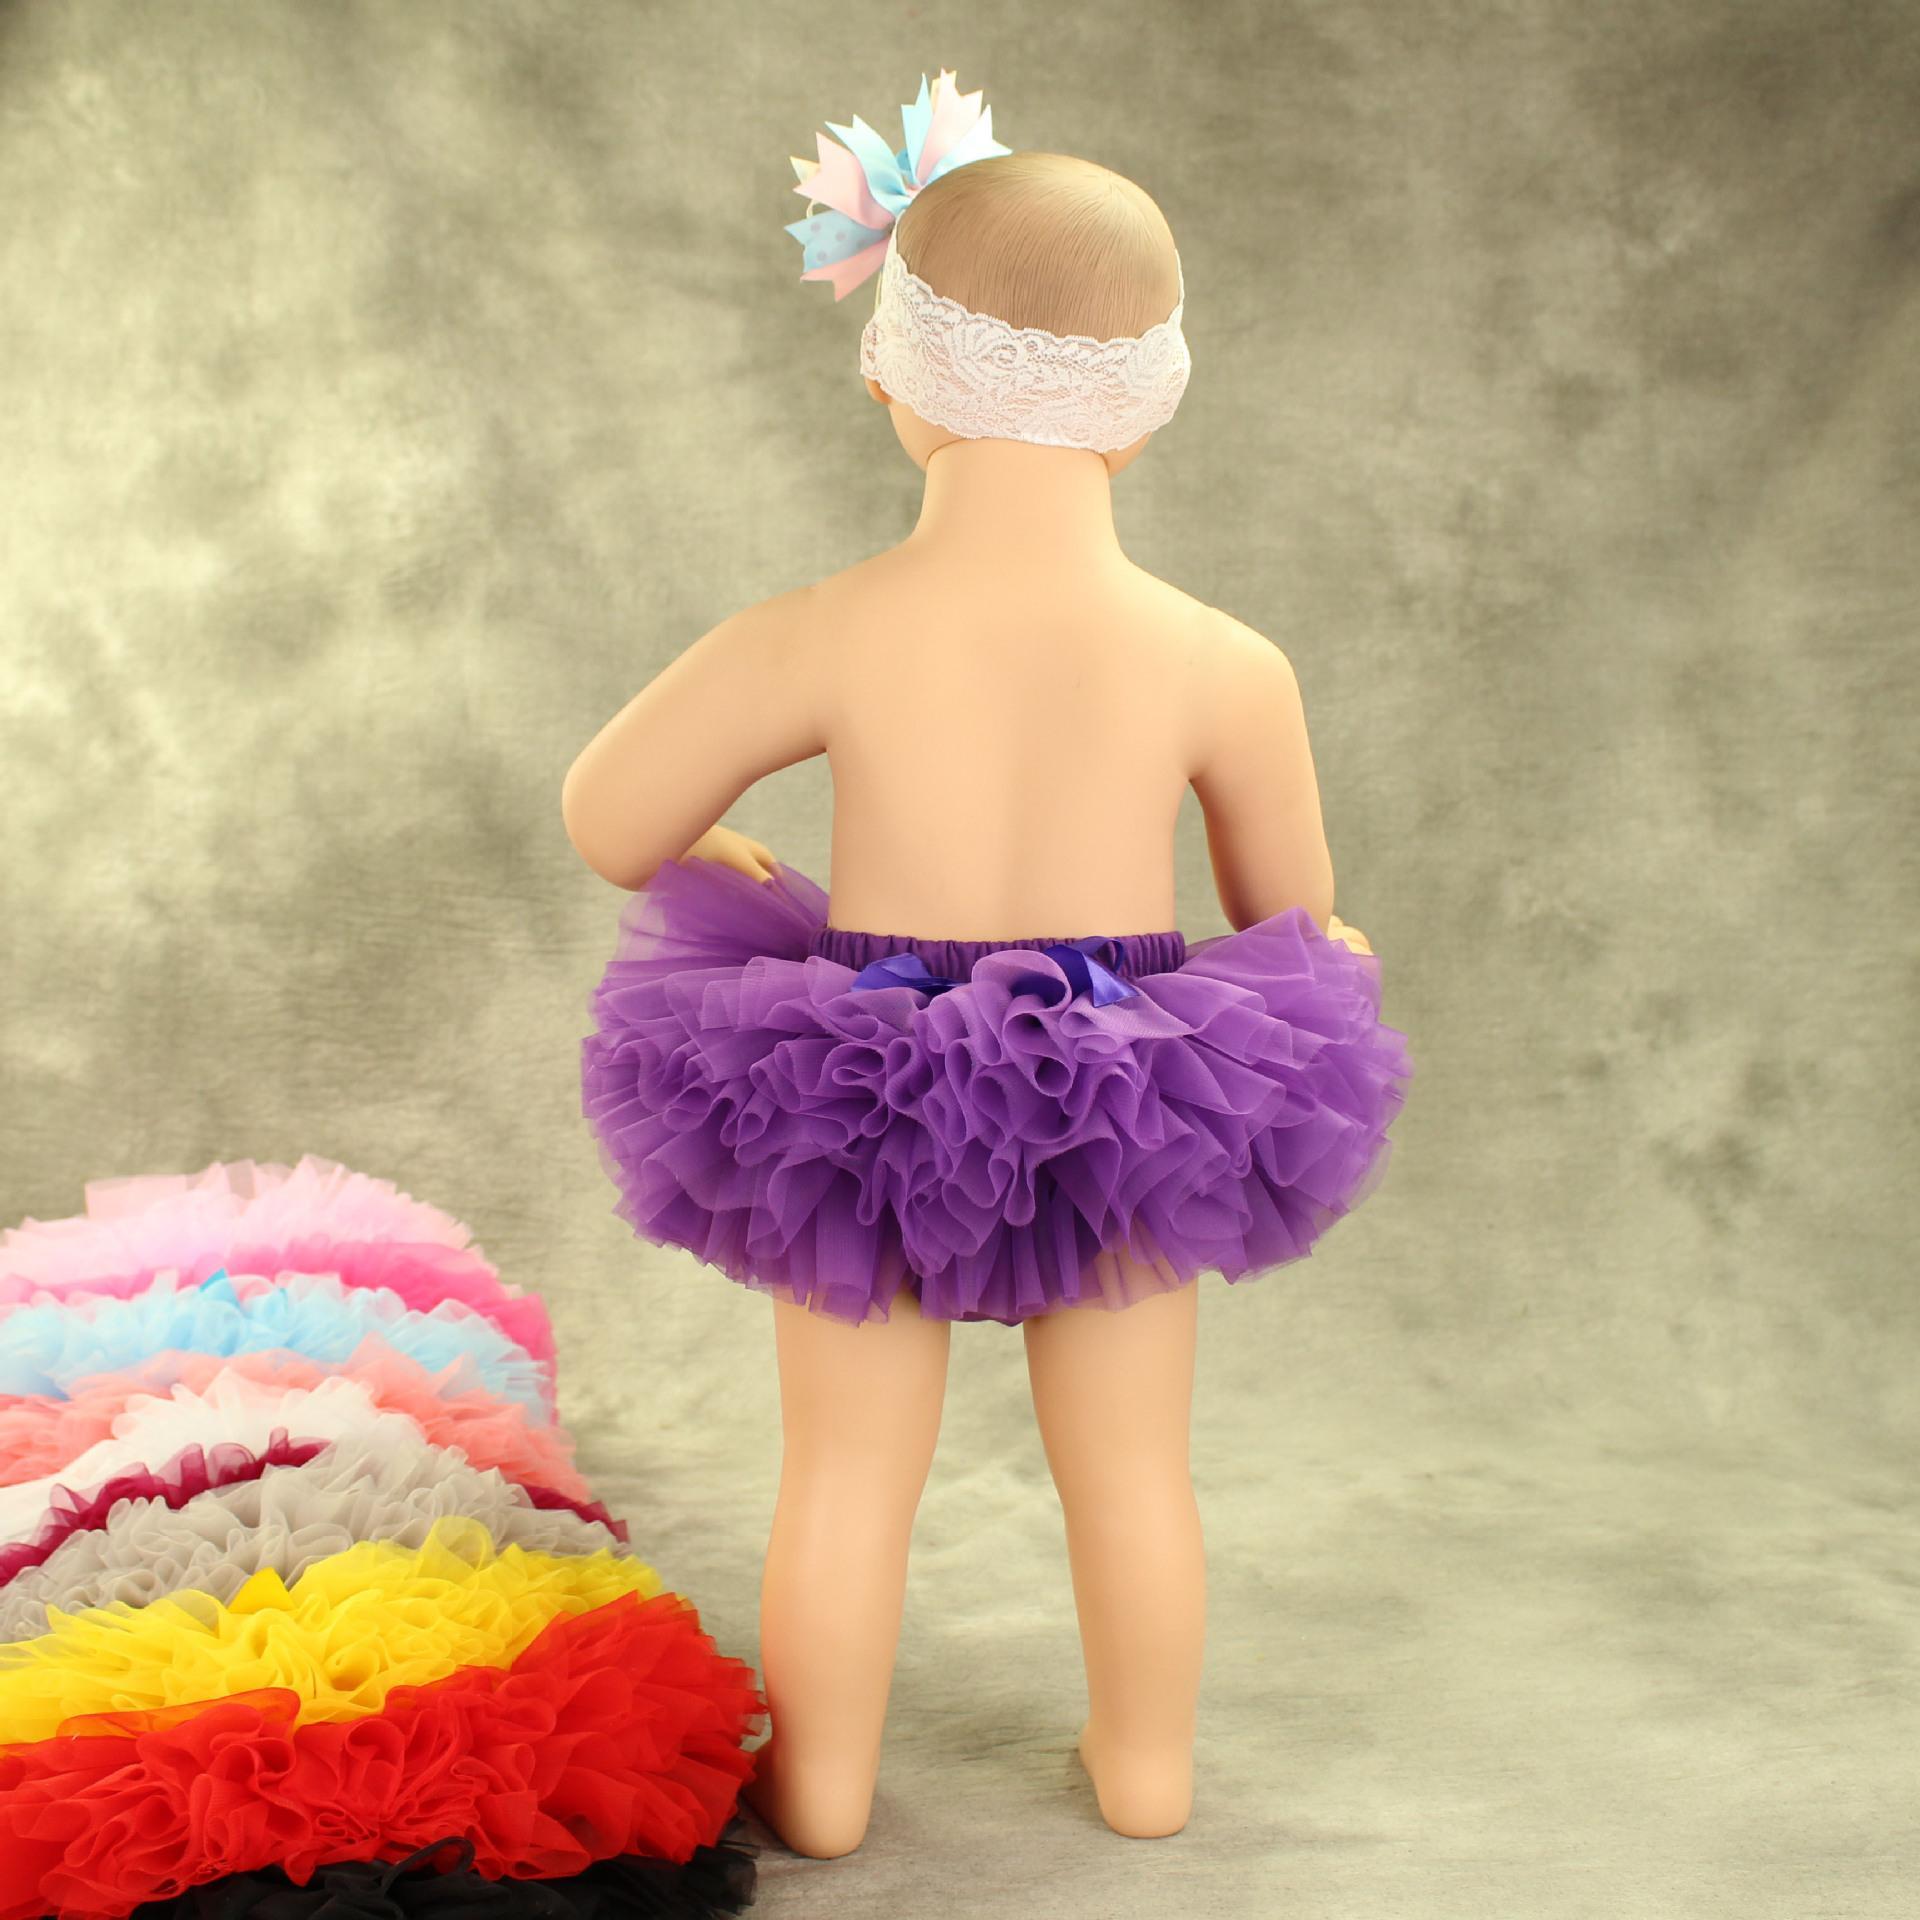 6f721a6eeaa 2019 Baby Girl Tutu Skirt Photography Newborn Infants Soft Tulle Tutu Dress  Cute Multi Layers Studio Prop 2017 From Allison87099